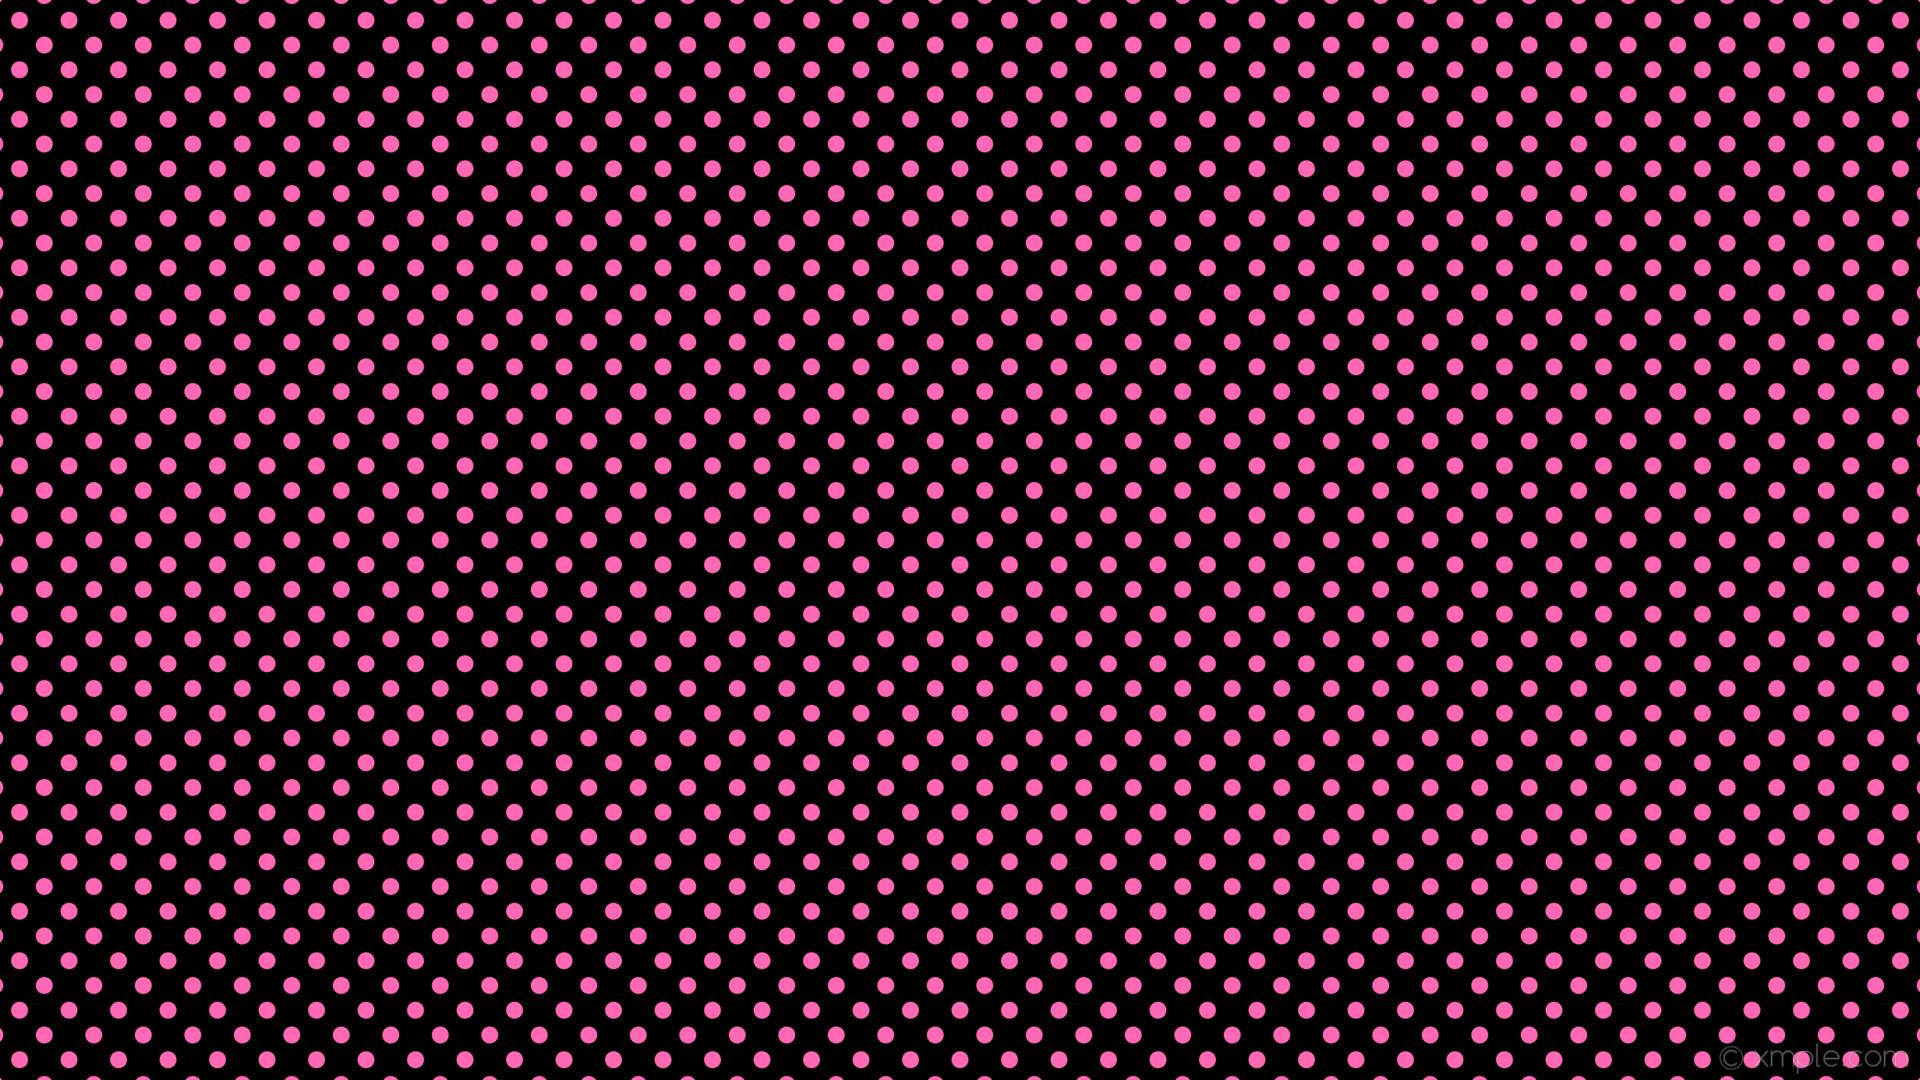 wallpaper pink black spots polka dots hot pink #000000 #ff69b4 135° 17px  35px